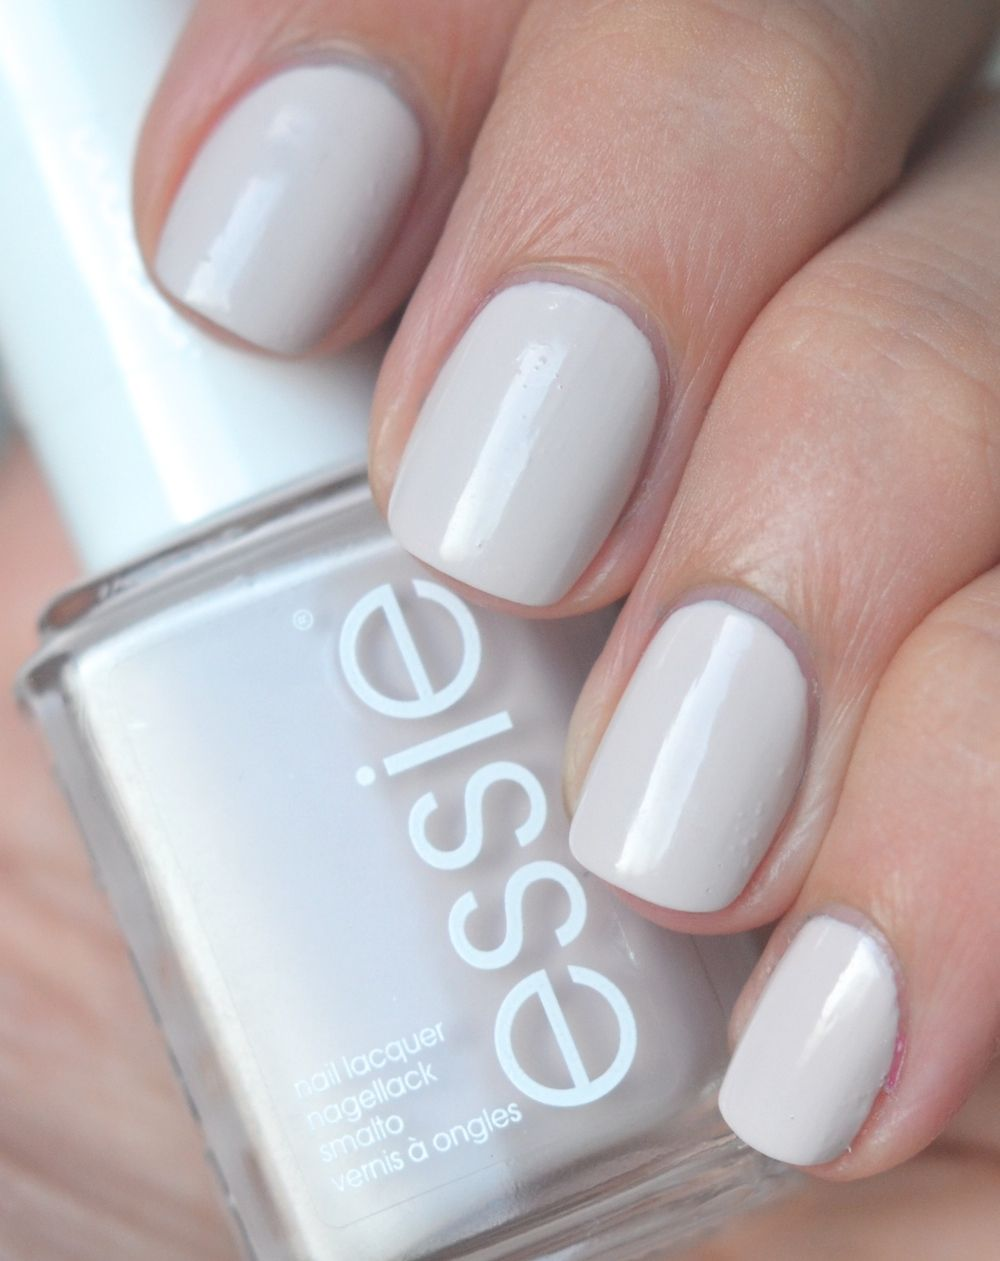 Essie - Urban Jungle - dusty nude with a slight pinkish gray tint ...